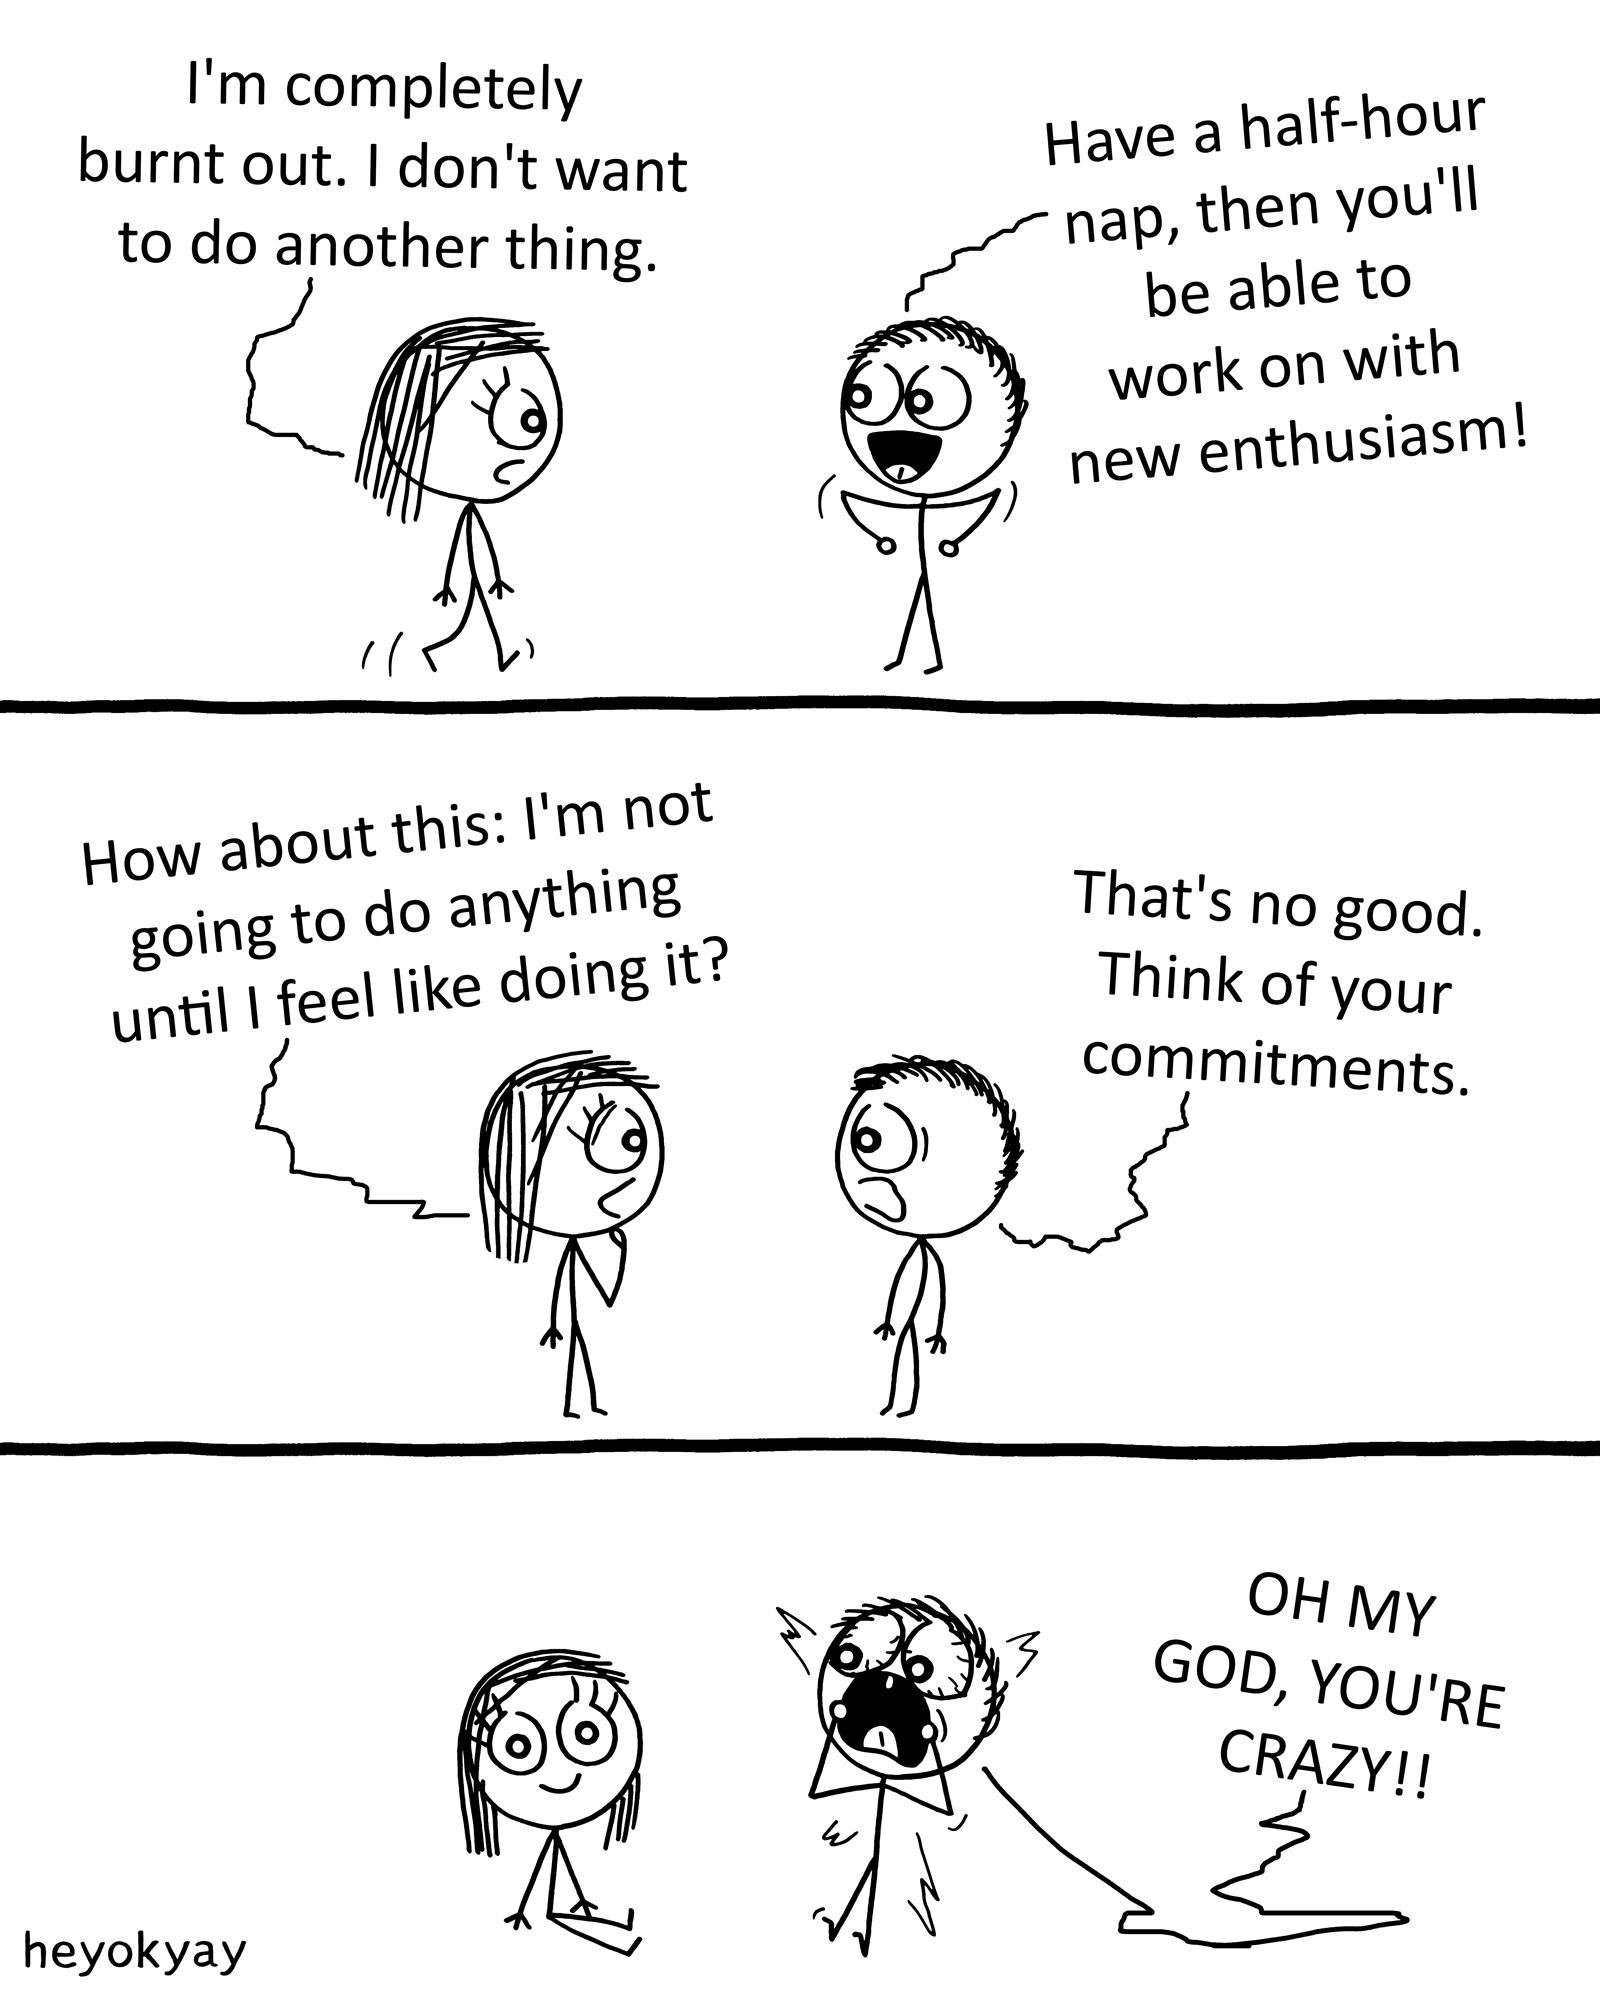 Burnout heyokyay comic